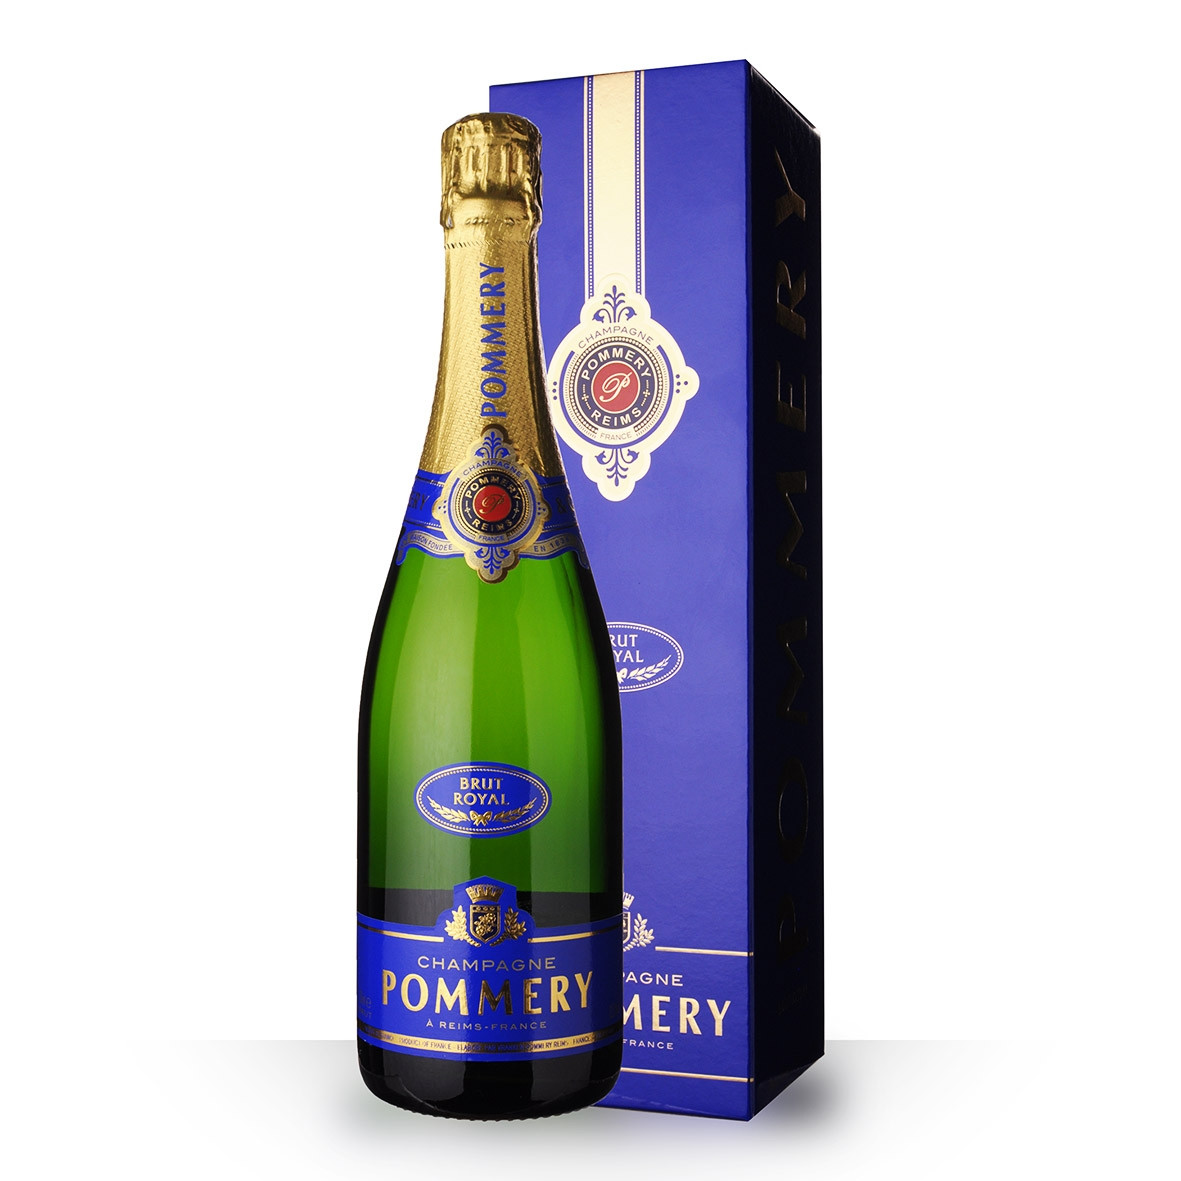 Champagne Pommery Brut Royal 75cl Etui www.odyssee-vins.com